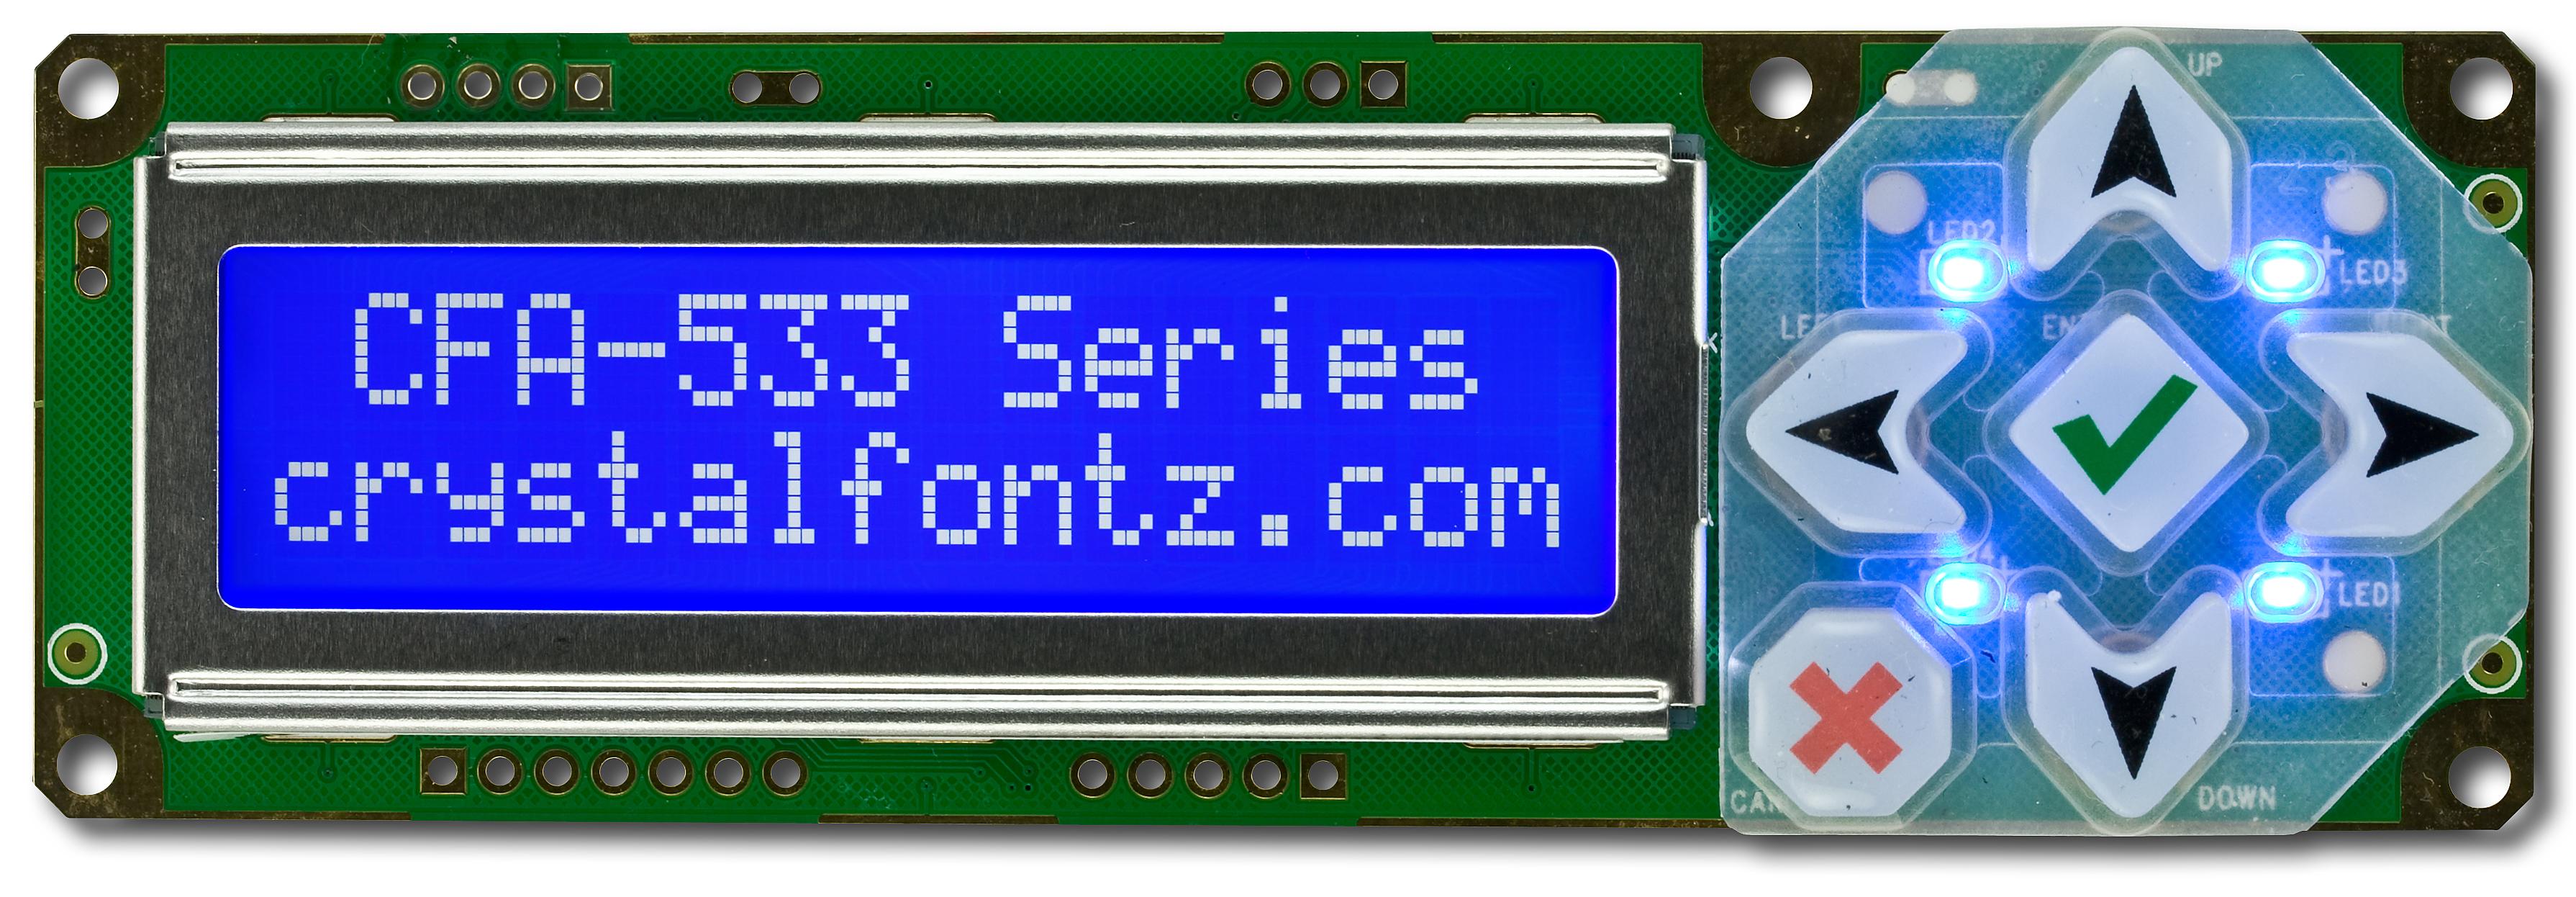 Crystalfontz LCD Module USB Driver for Windows 7